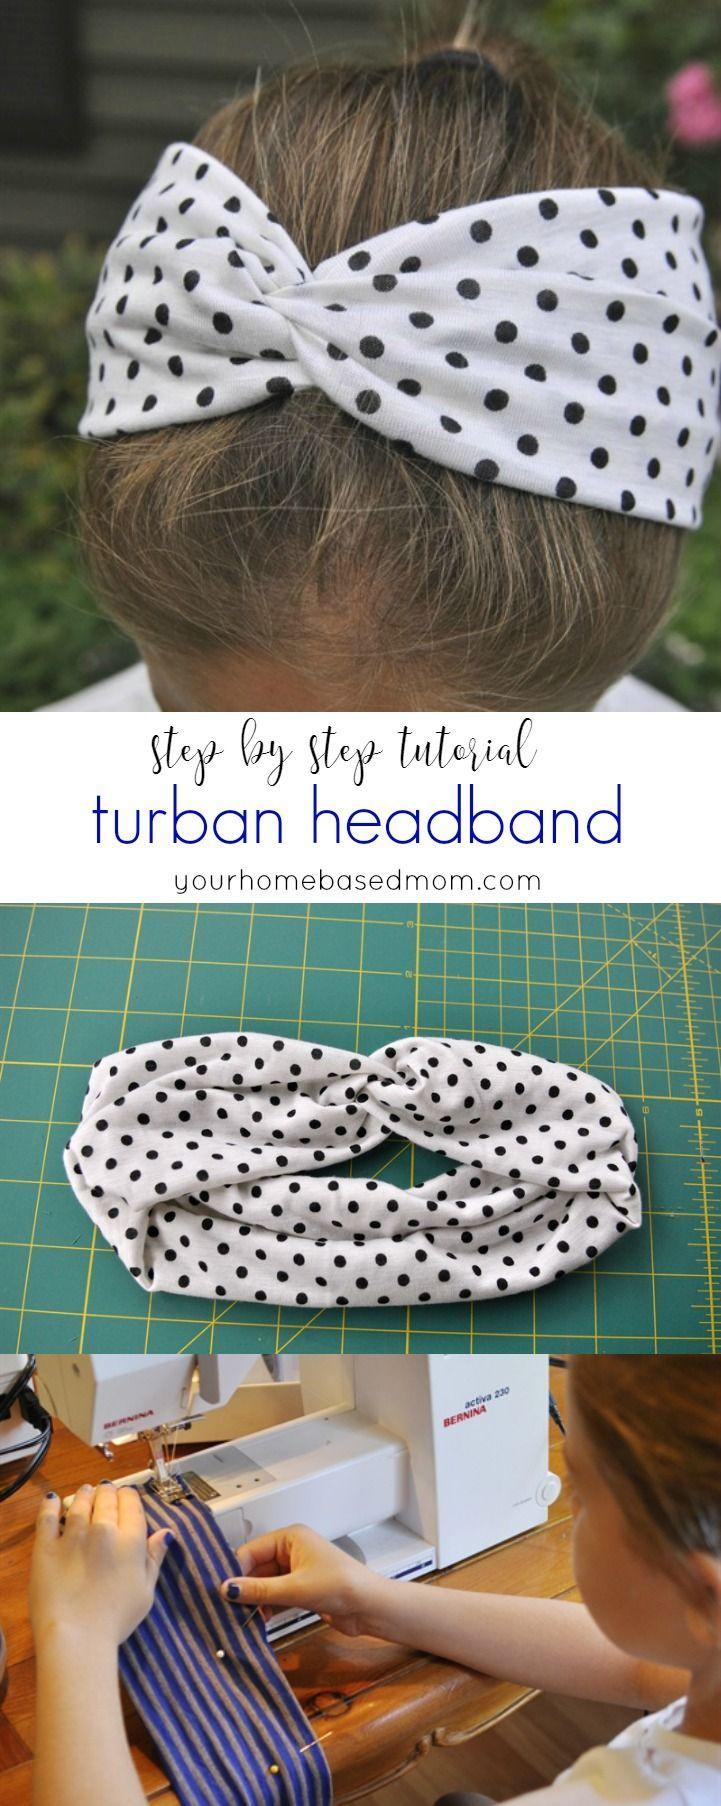 Turban Headband Step by Step Tutorial @yourhomebasedmom.com